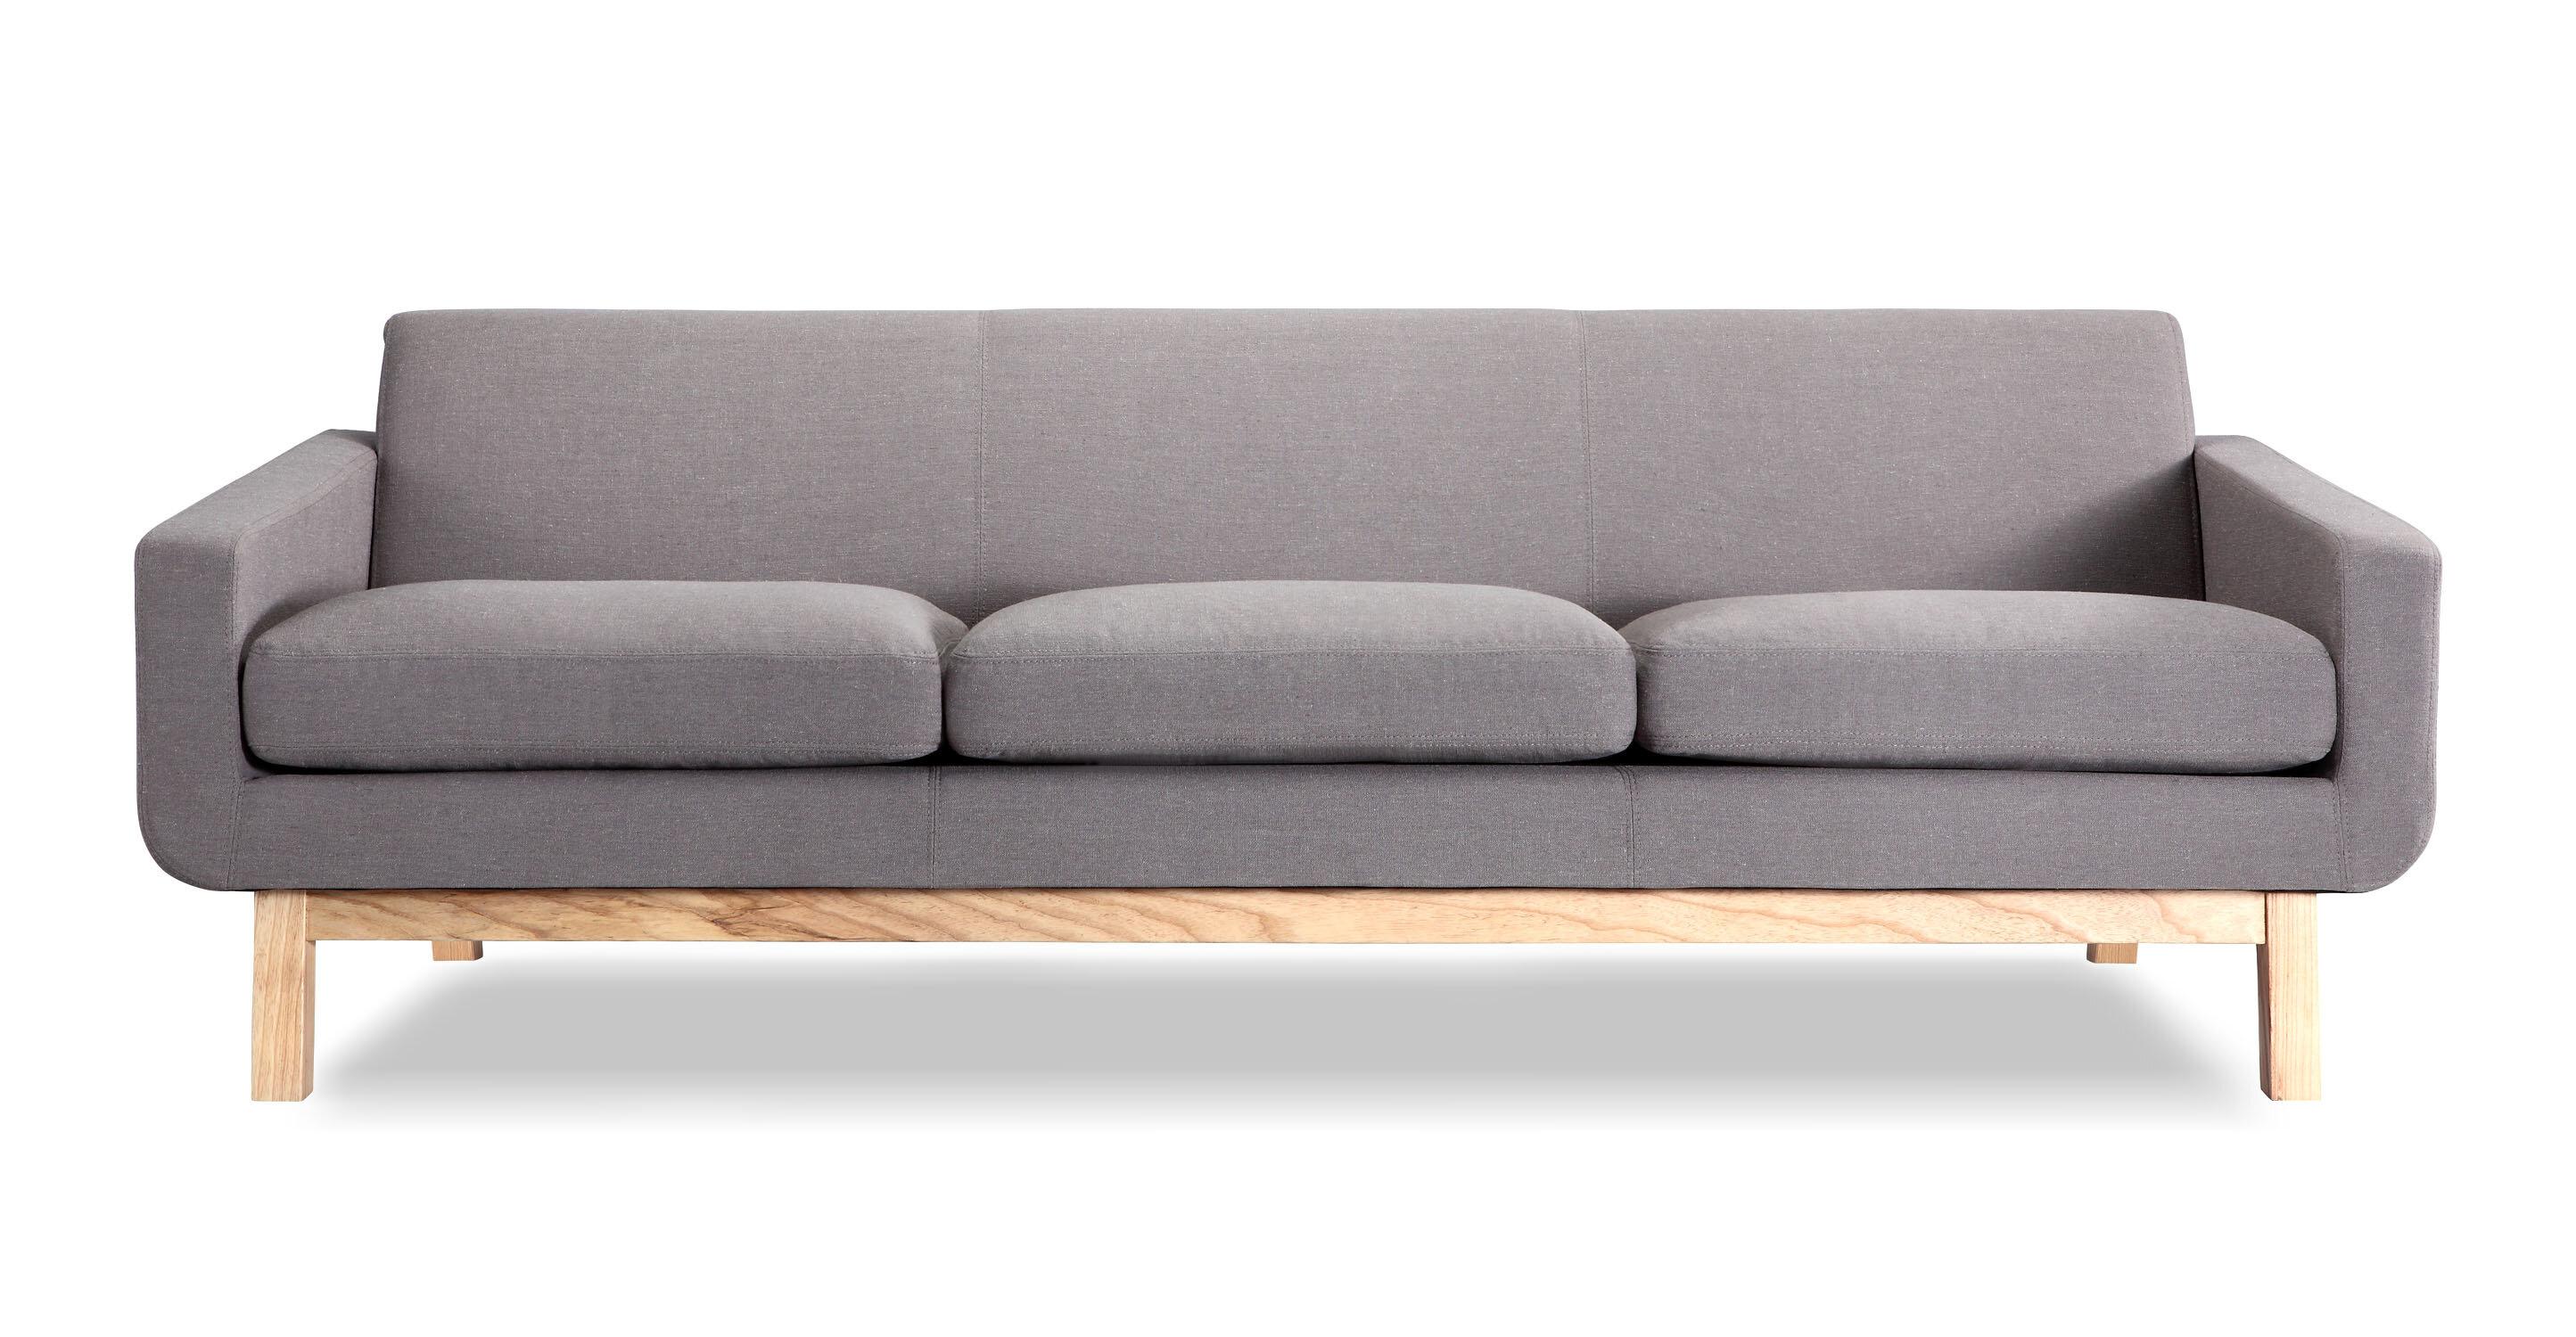 Comm Office Antora Modern Classic Sofa | Wayfair